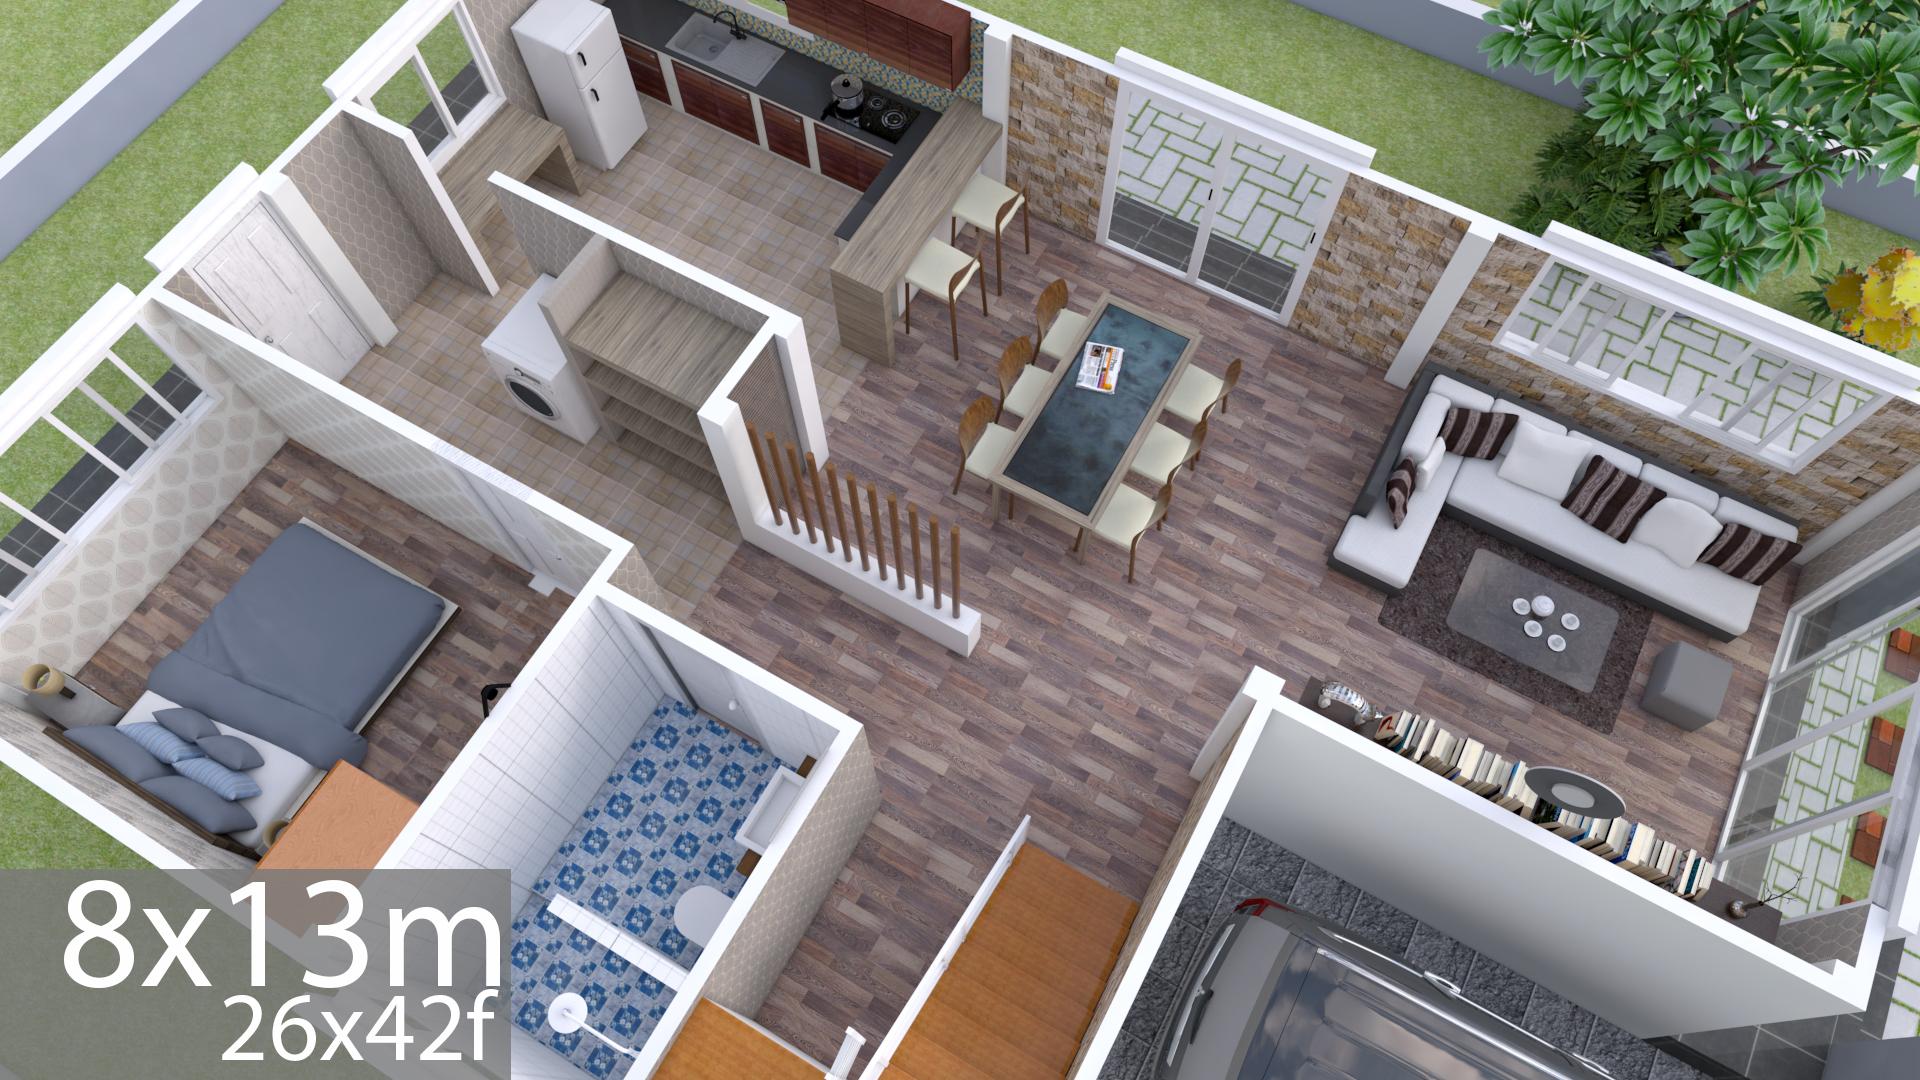 Plan 3D Interior Design Home Plan 8x13m Full Plan 3Beds ...